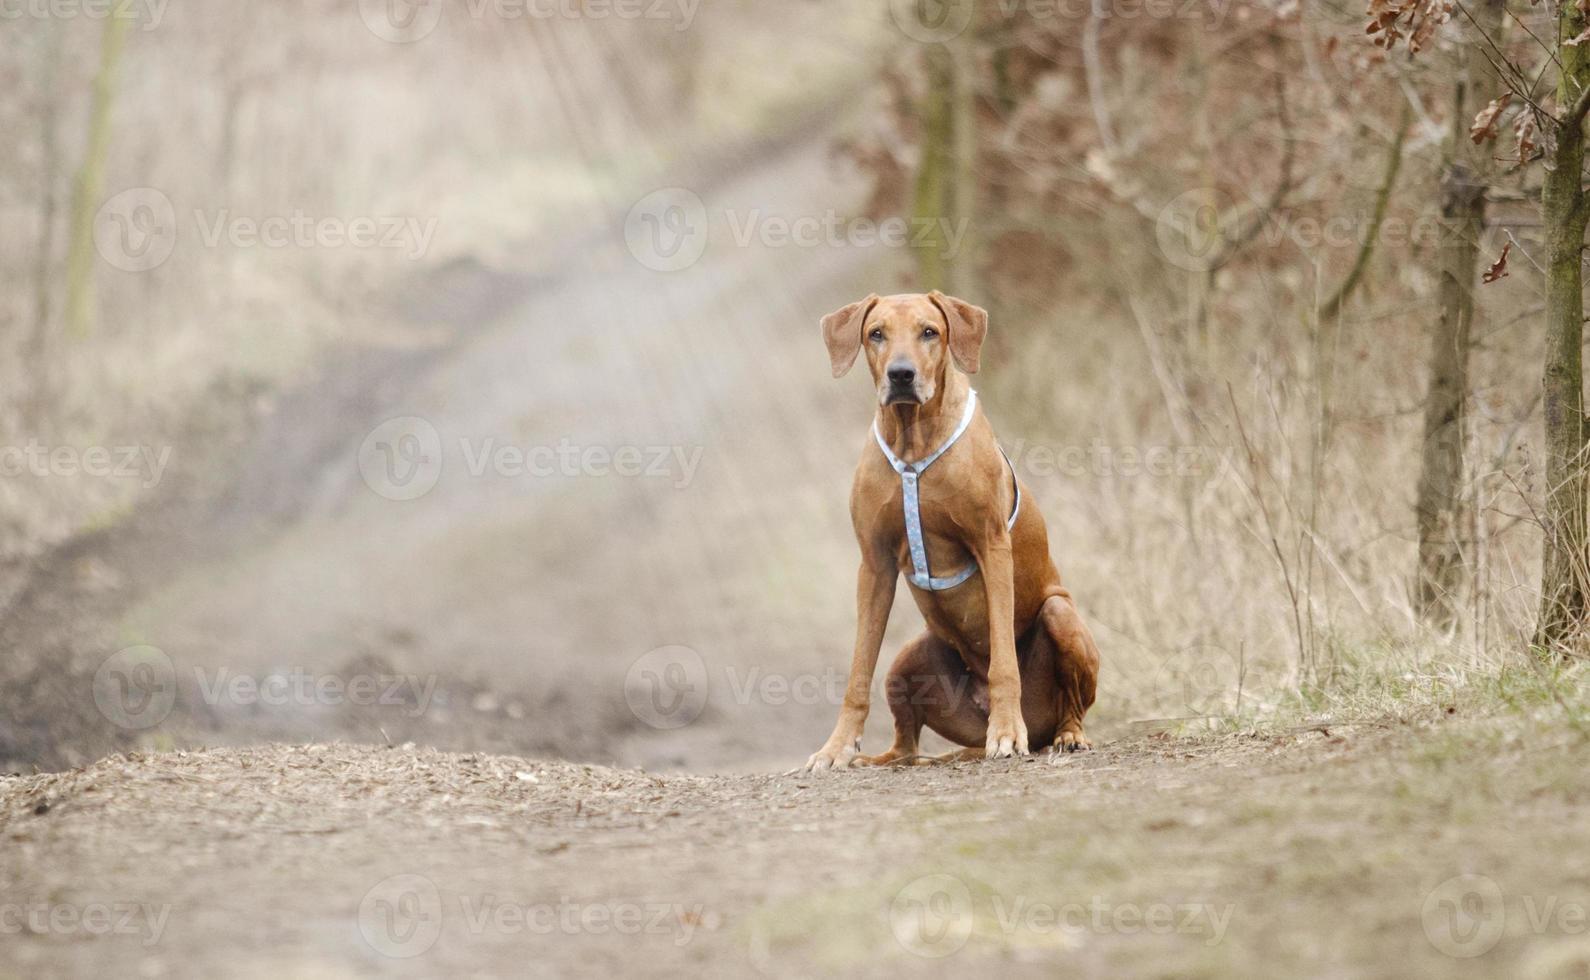 anxiété rhodesian ridgeback chien chiot assis au printemps fond photo